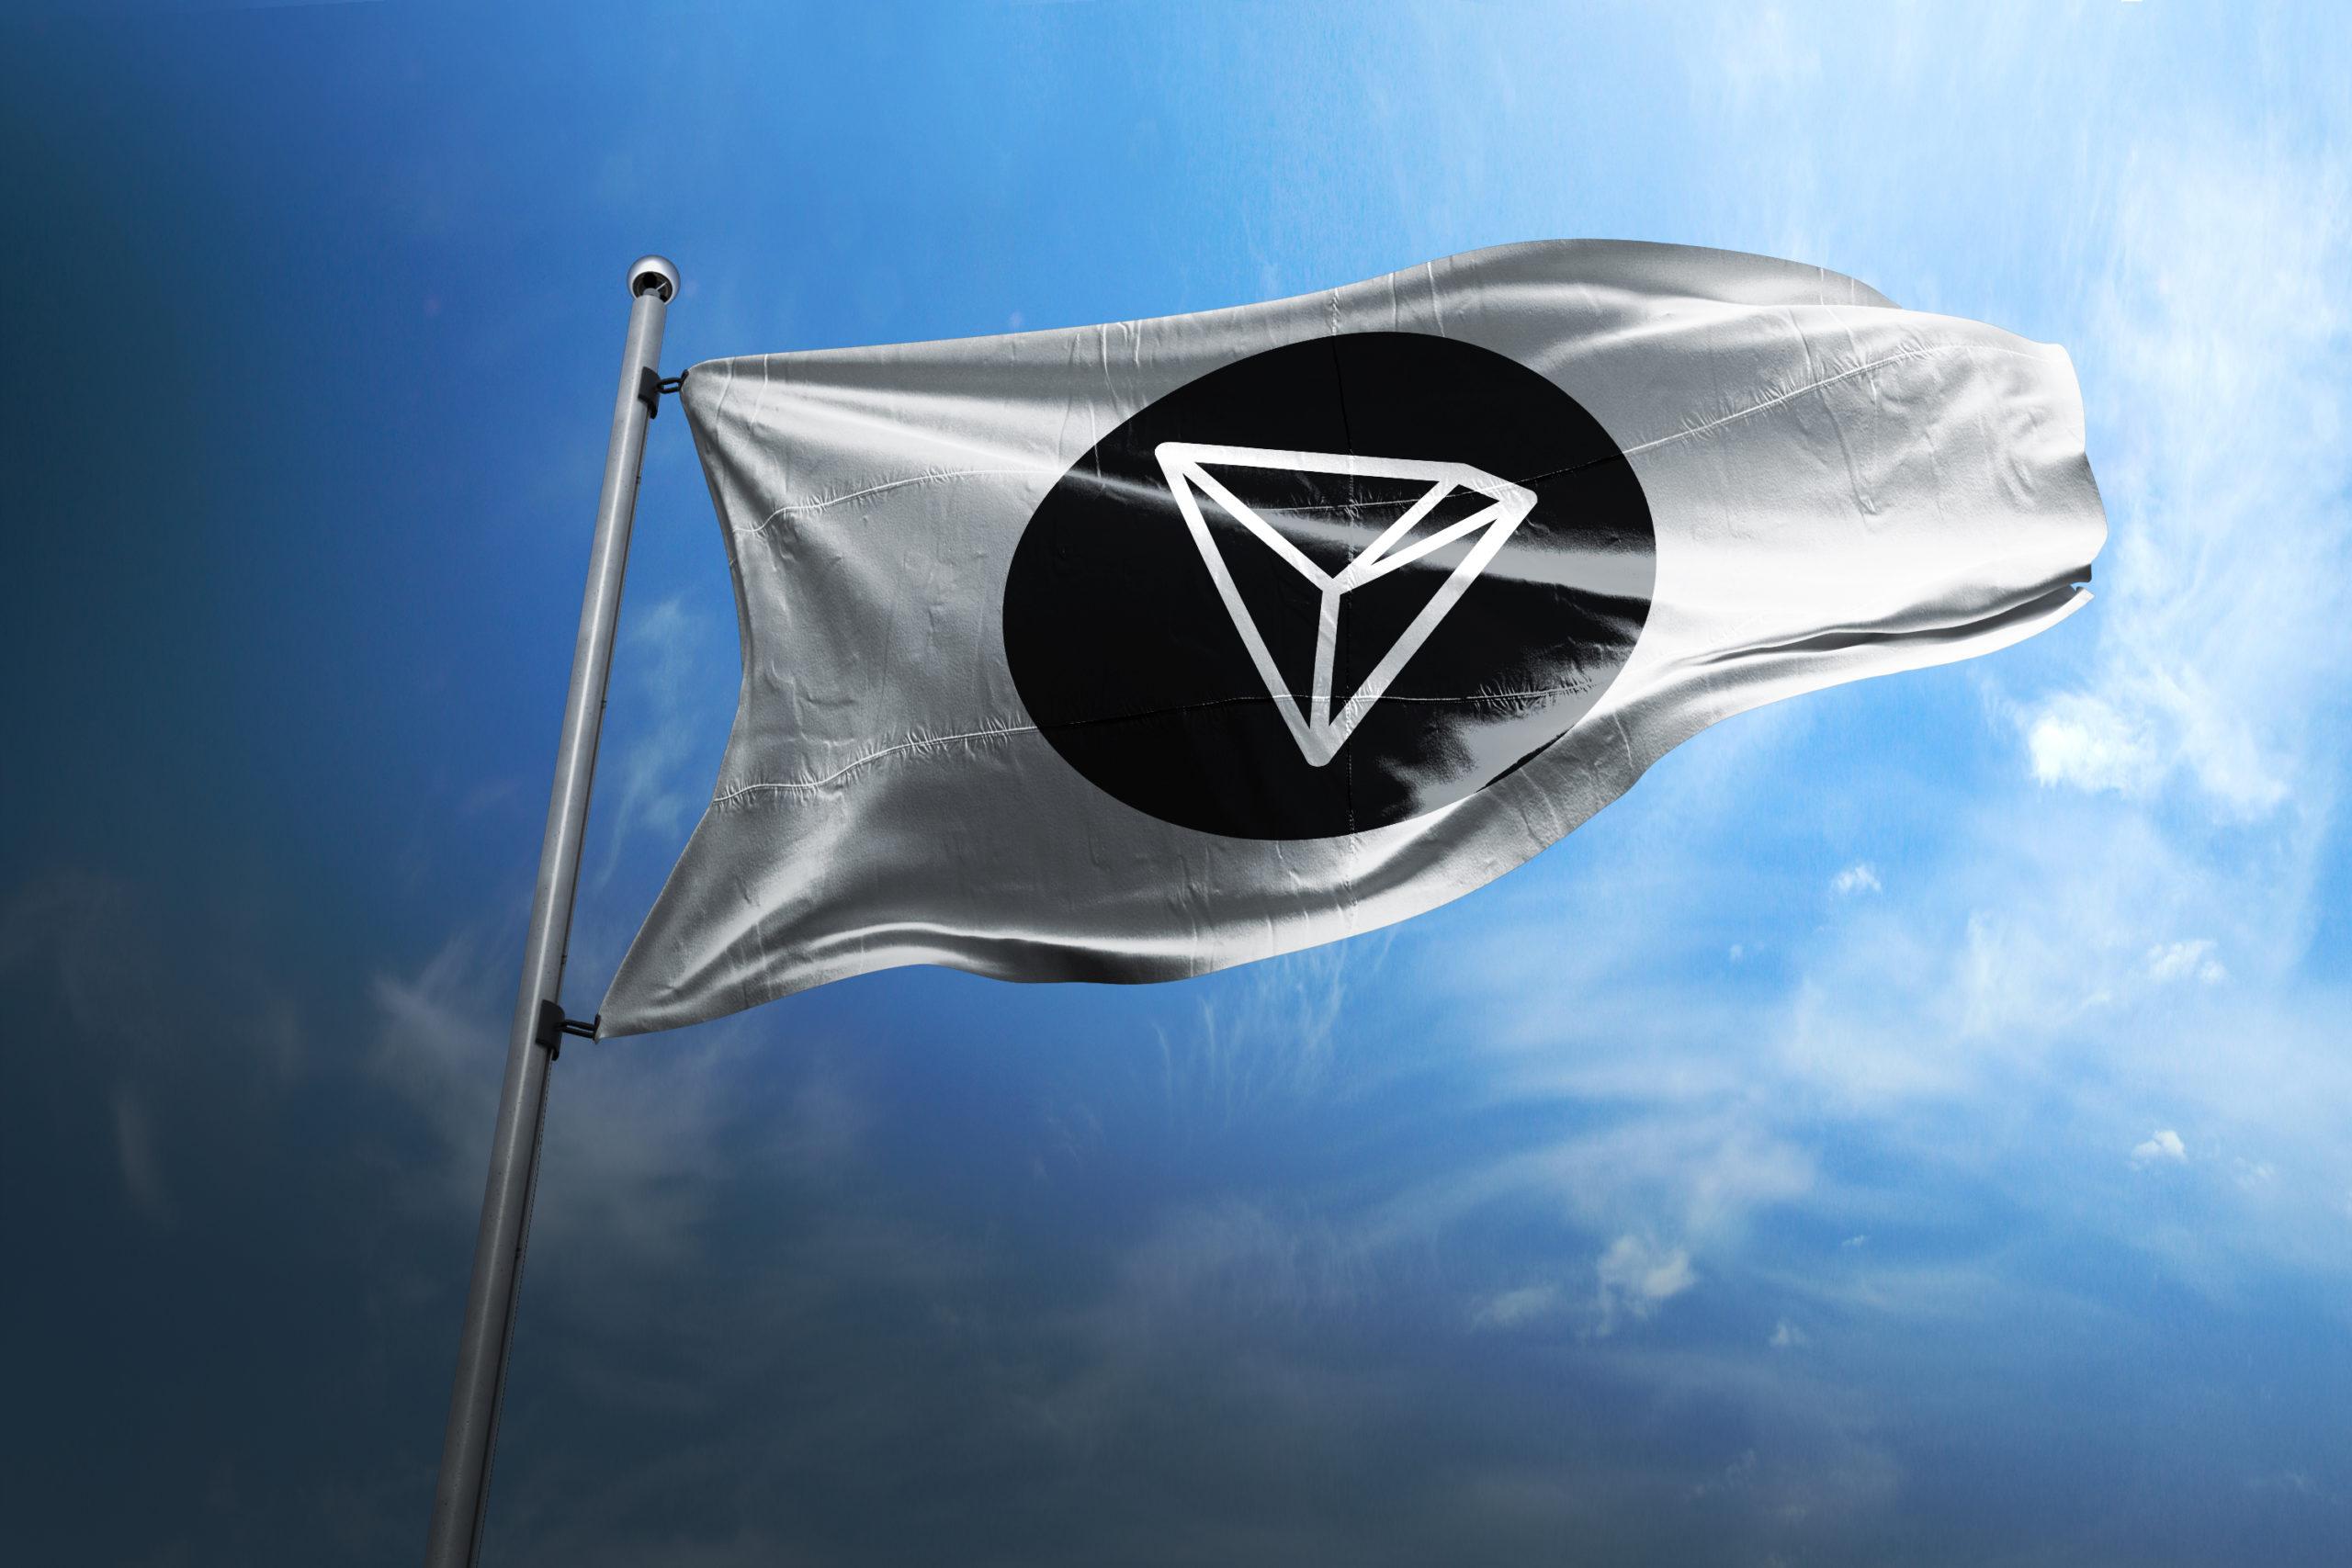 Tron Distributes $633.3k worth of USDT in APR